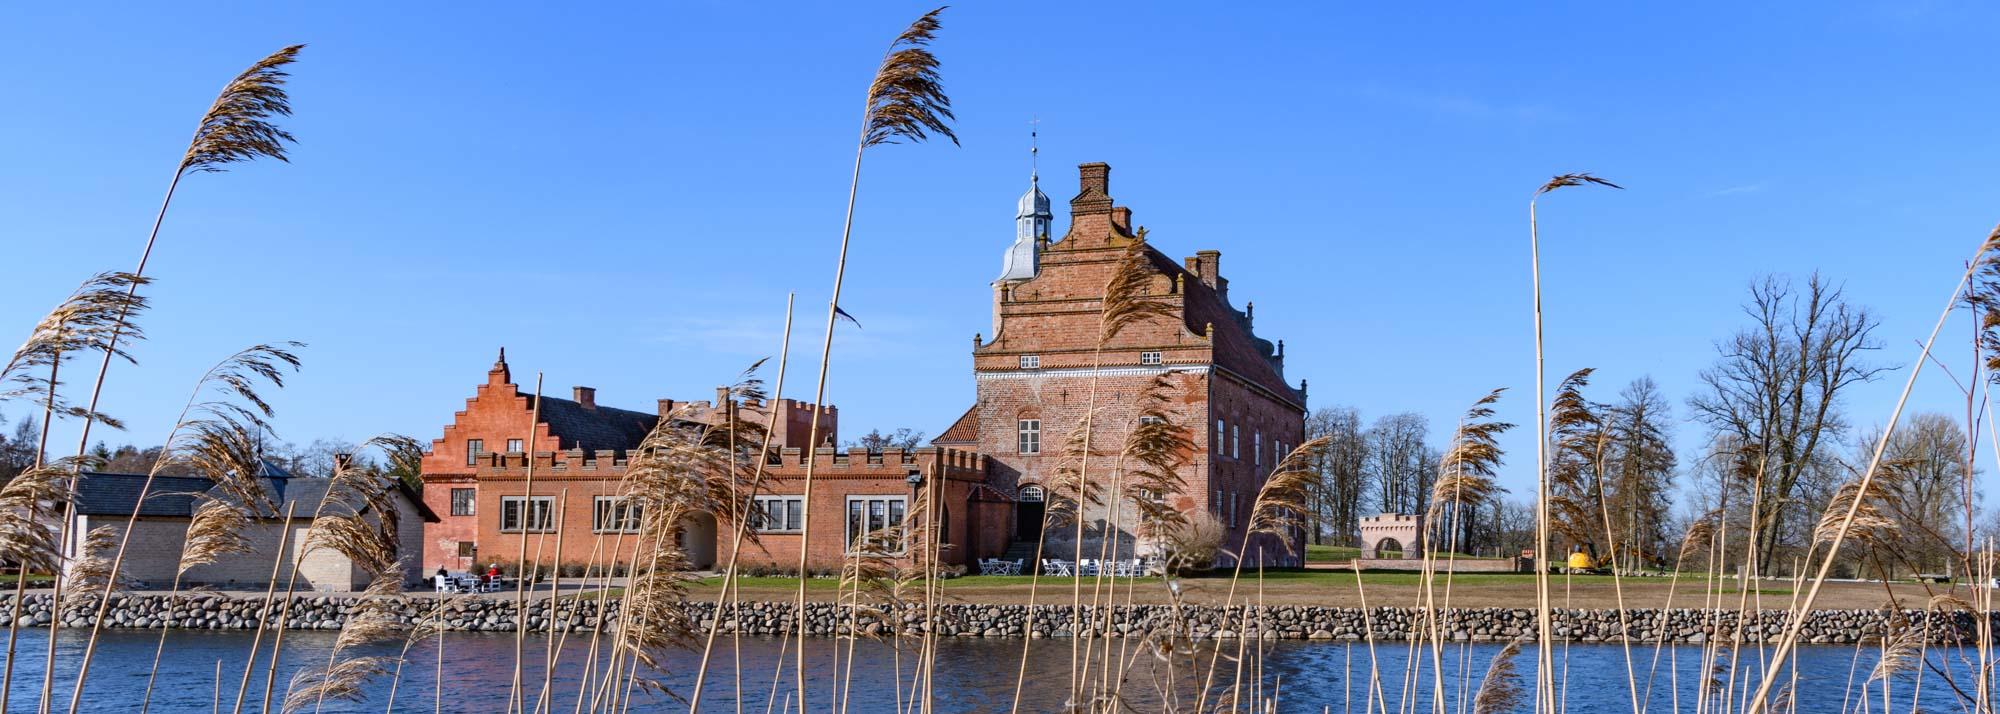 Broholm Slot, Fyn